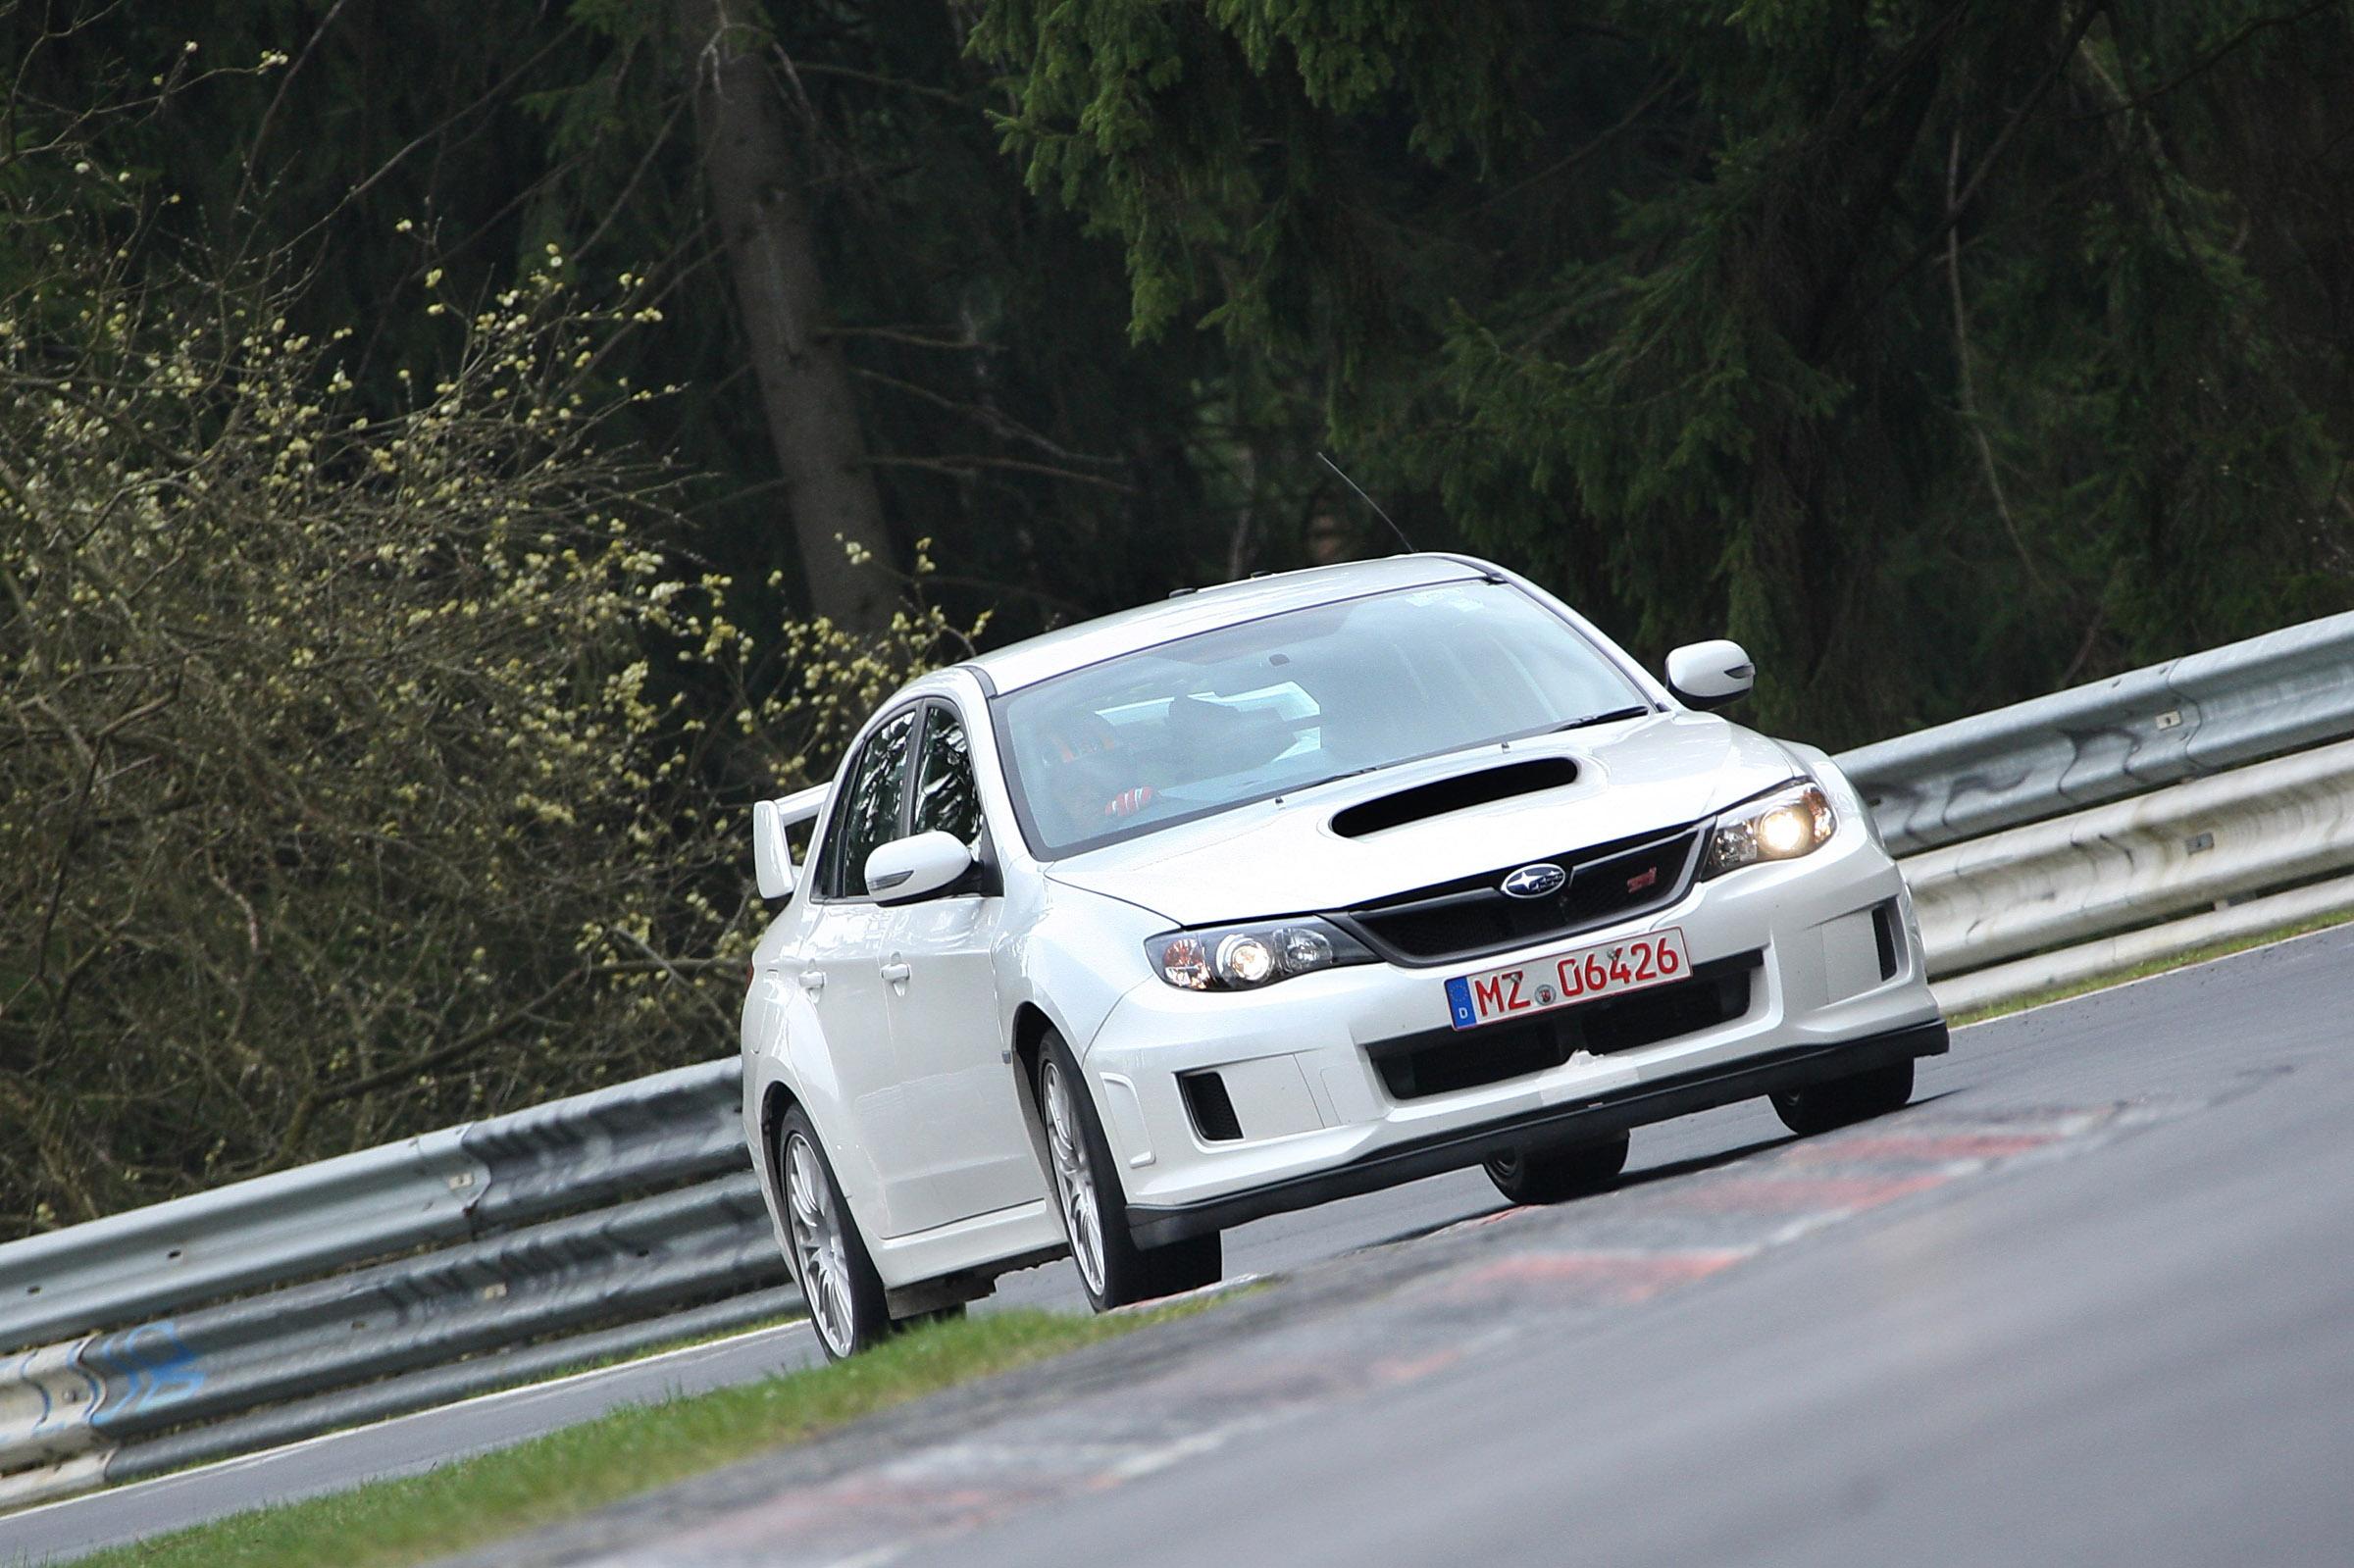 2011 Subaru WRX STi седан испытания на Нюрбургринге - фотография №9